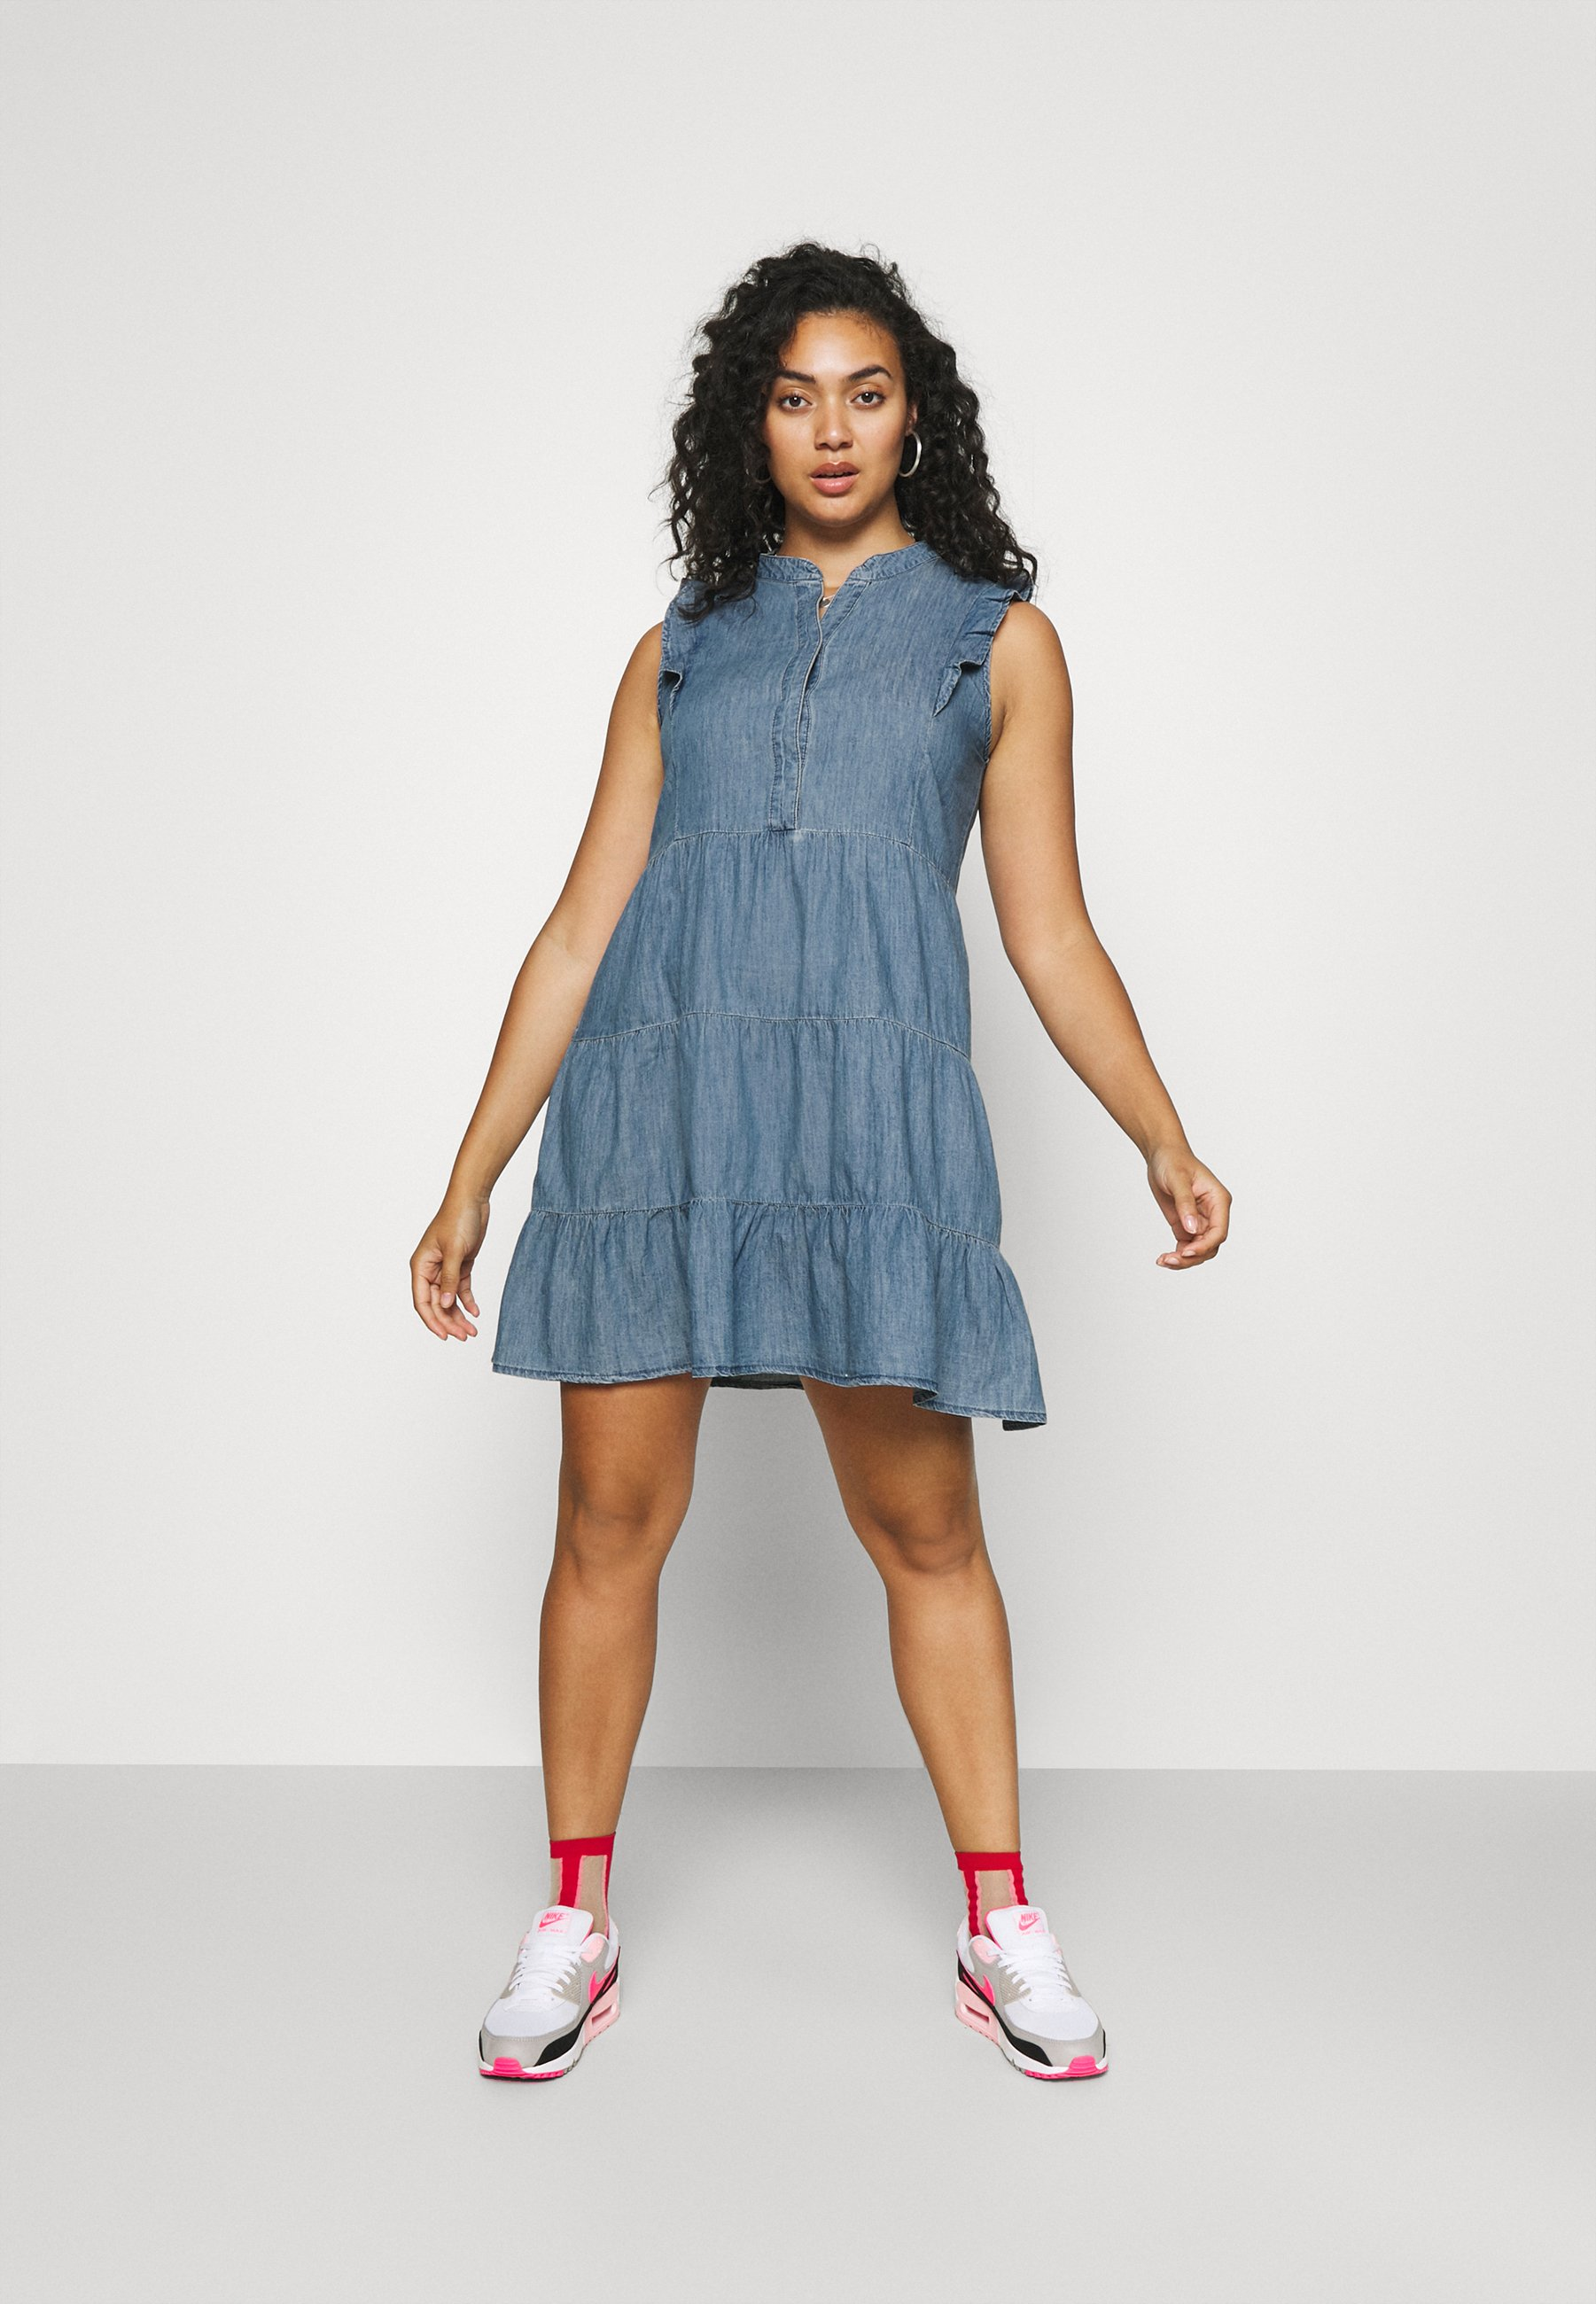 Women CARESMA LIFE TUNIC DRESS - Denim dress